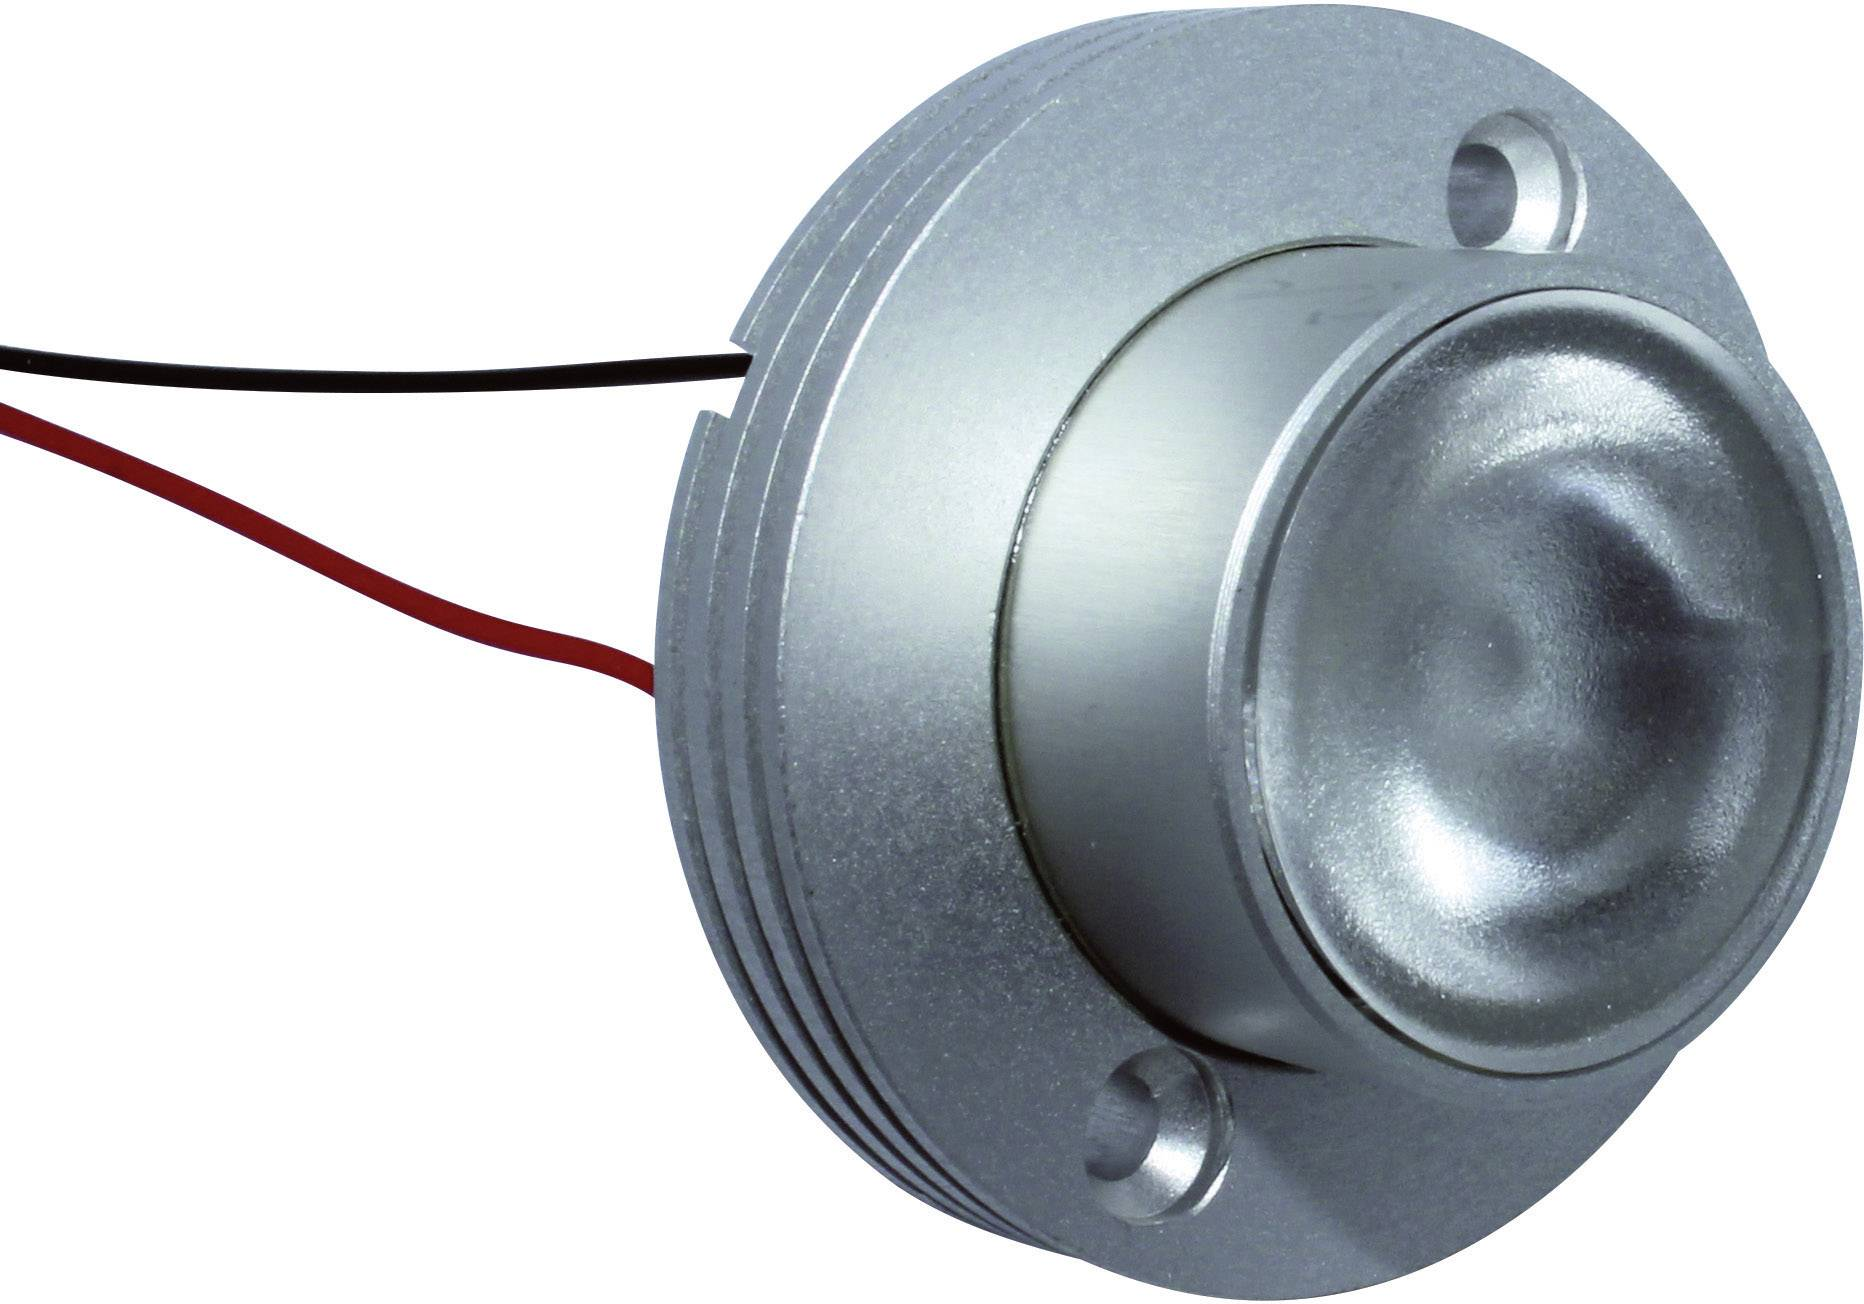 HighPower LED-spot Signal Construct QAUR1121L030, 15 °, 130 lm, 1 W, 3.6 V, zelená